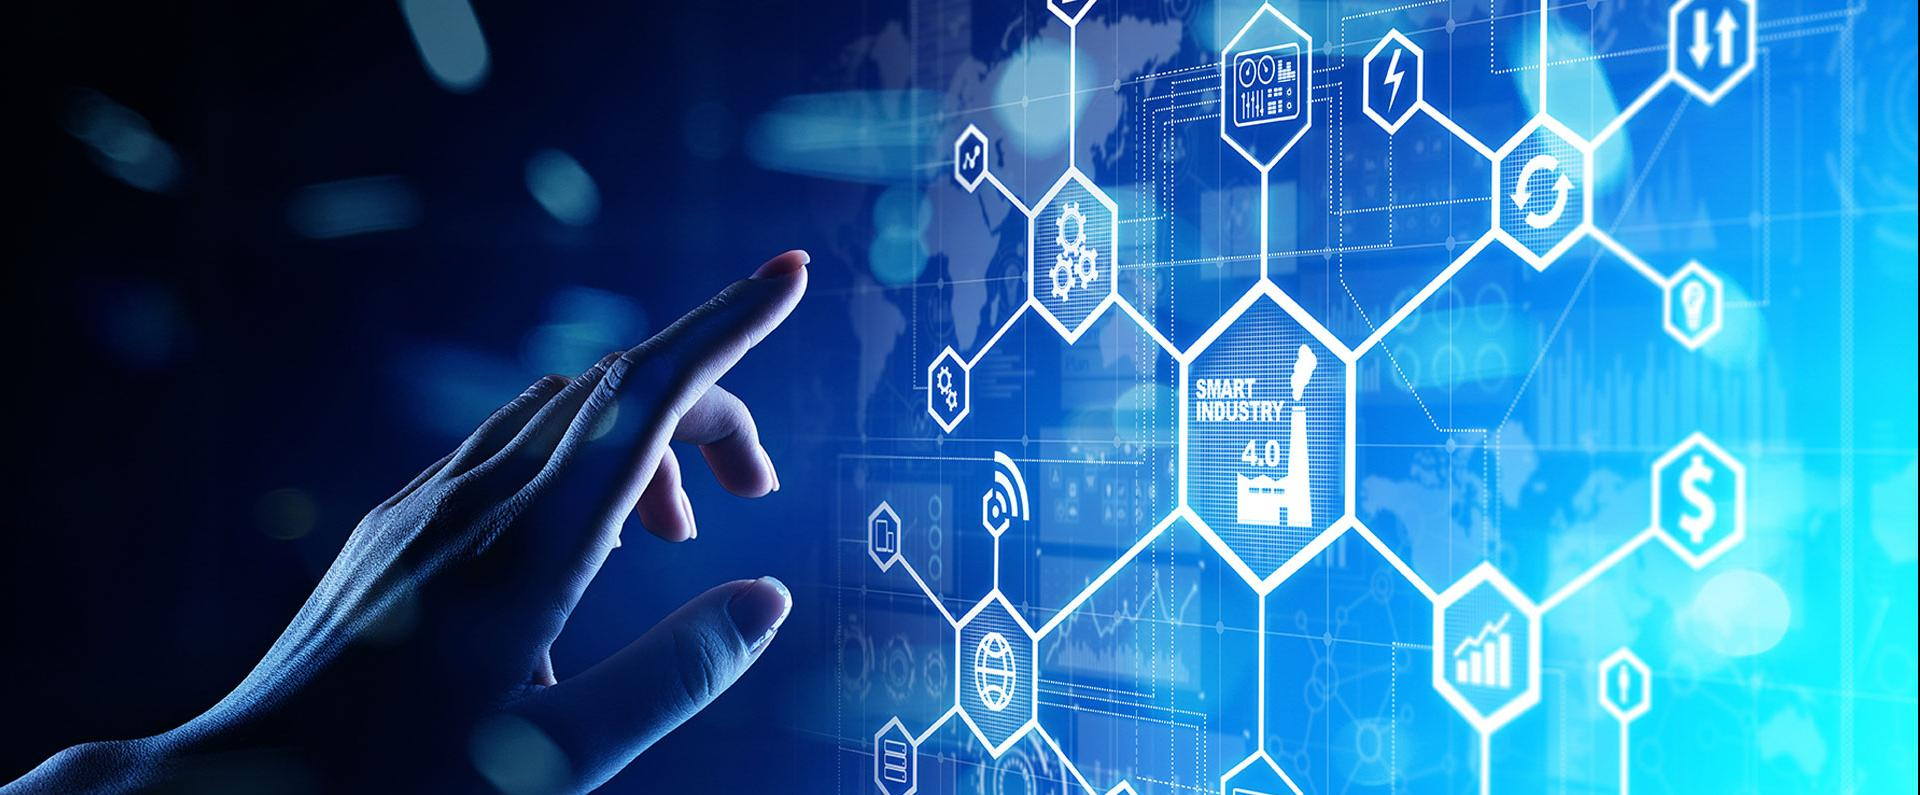 ICS Network Security And Segmentation